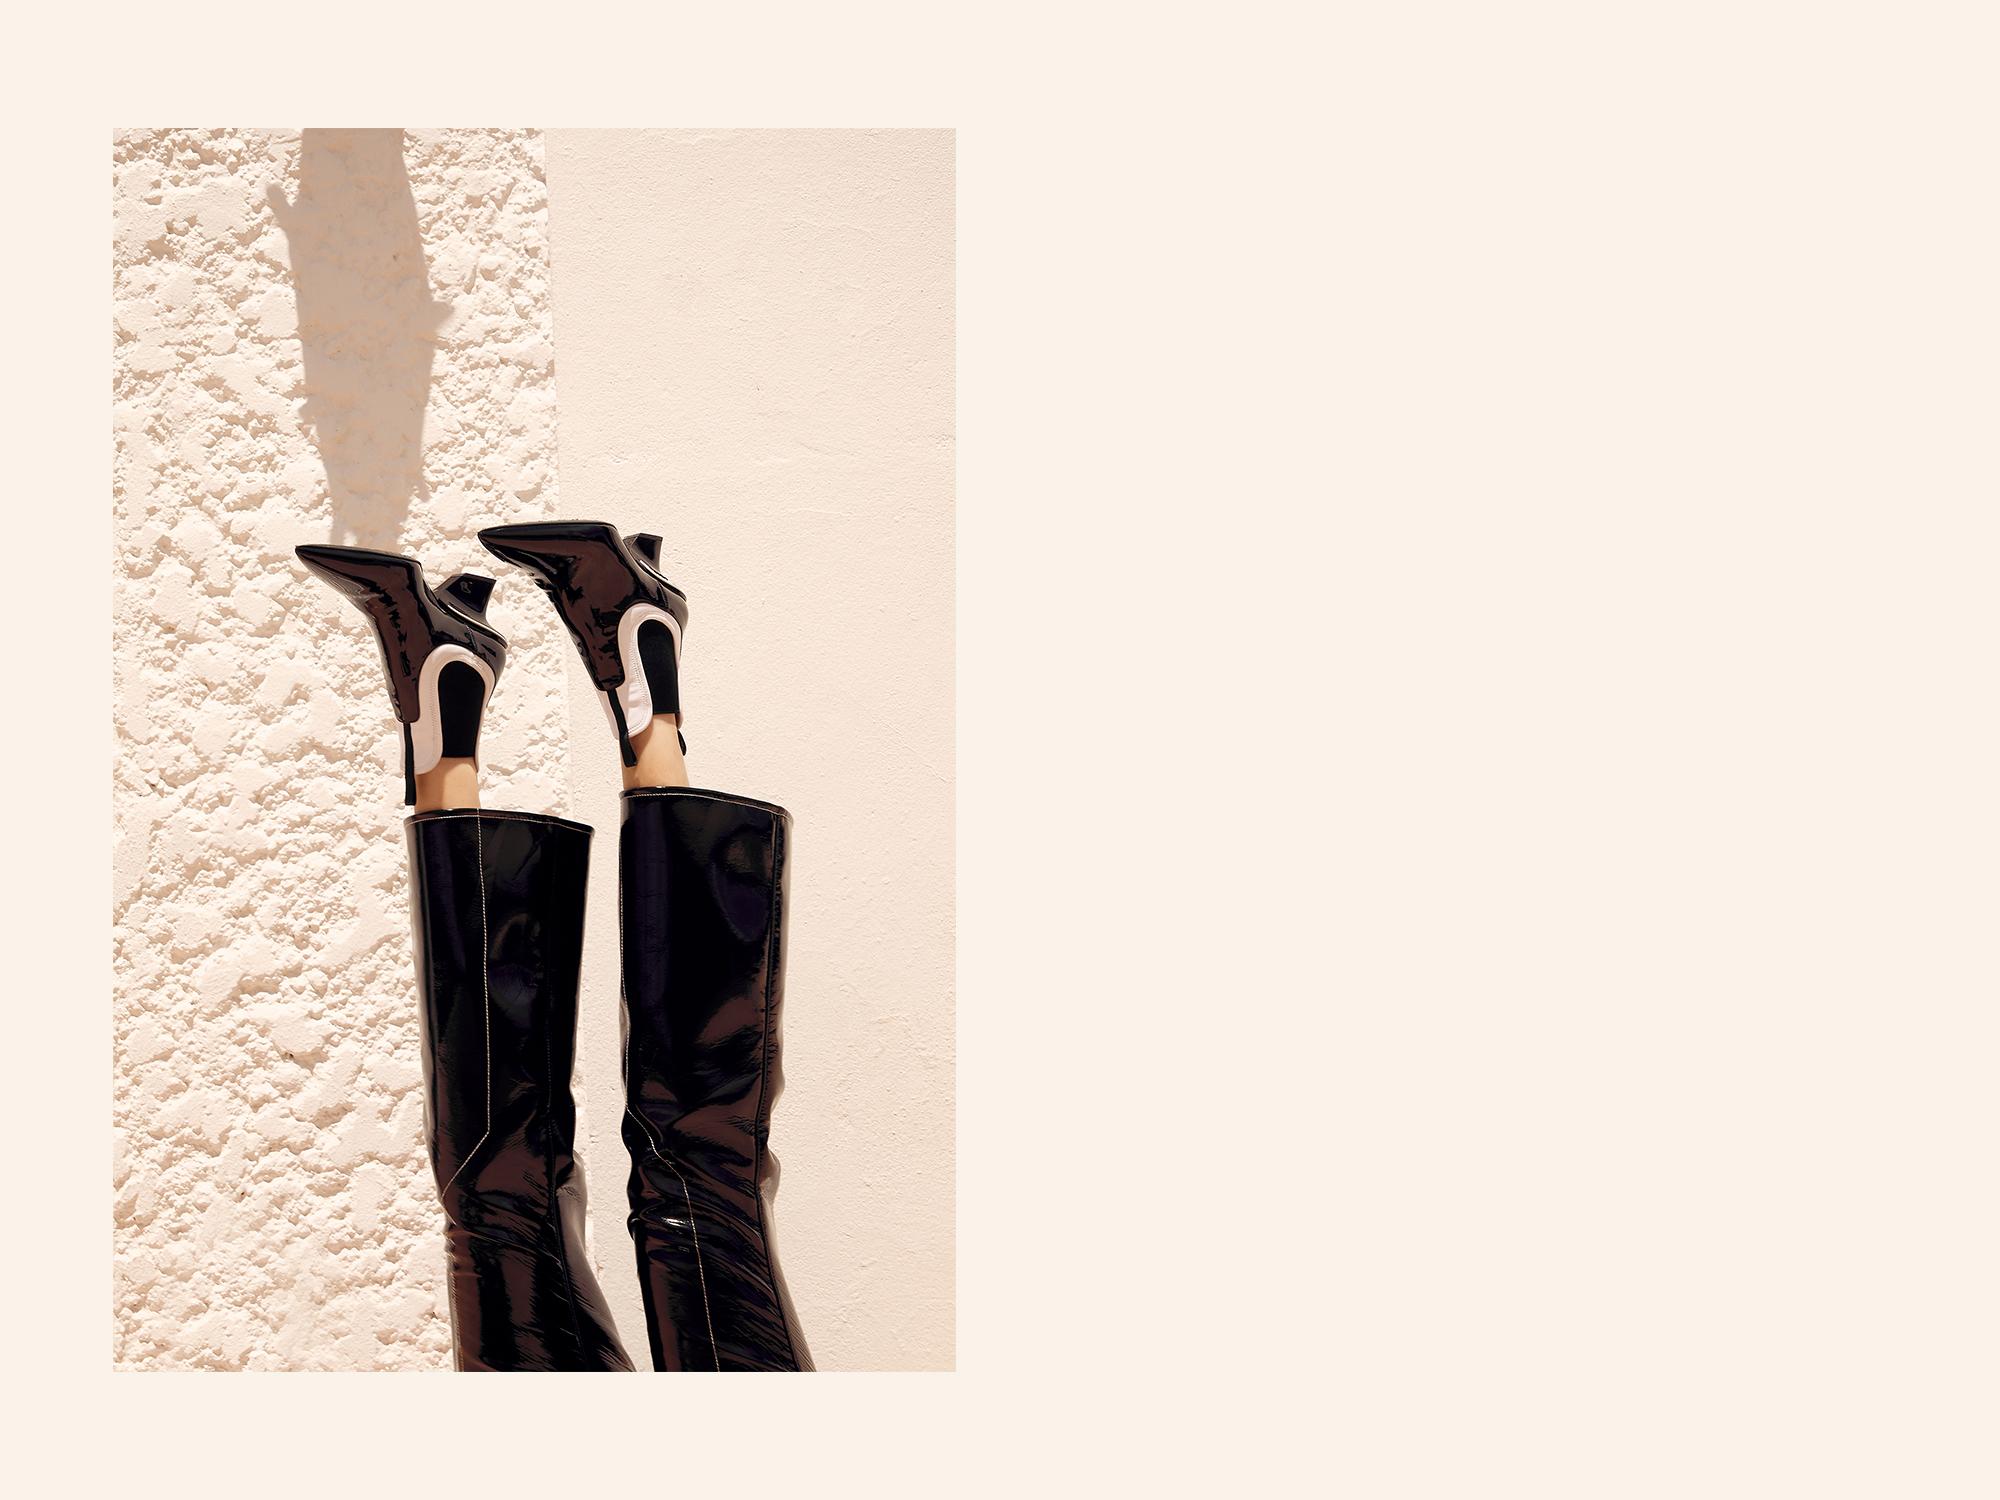 Editors-Outfit-Black, Prada, Boots, Balenciaga, Crystal Earrings, Editors Outfit, Oracle, Fox